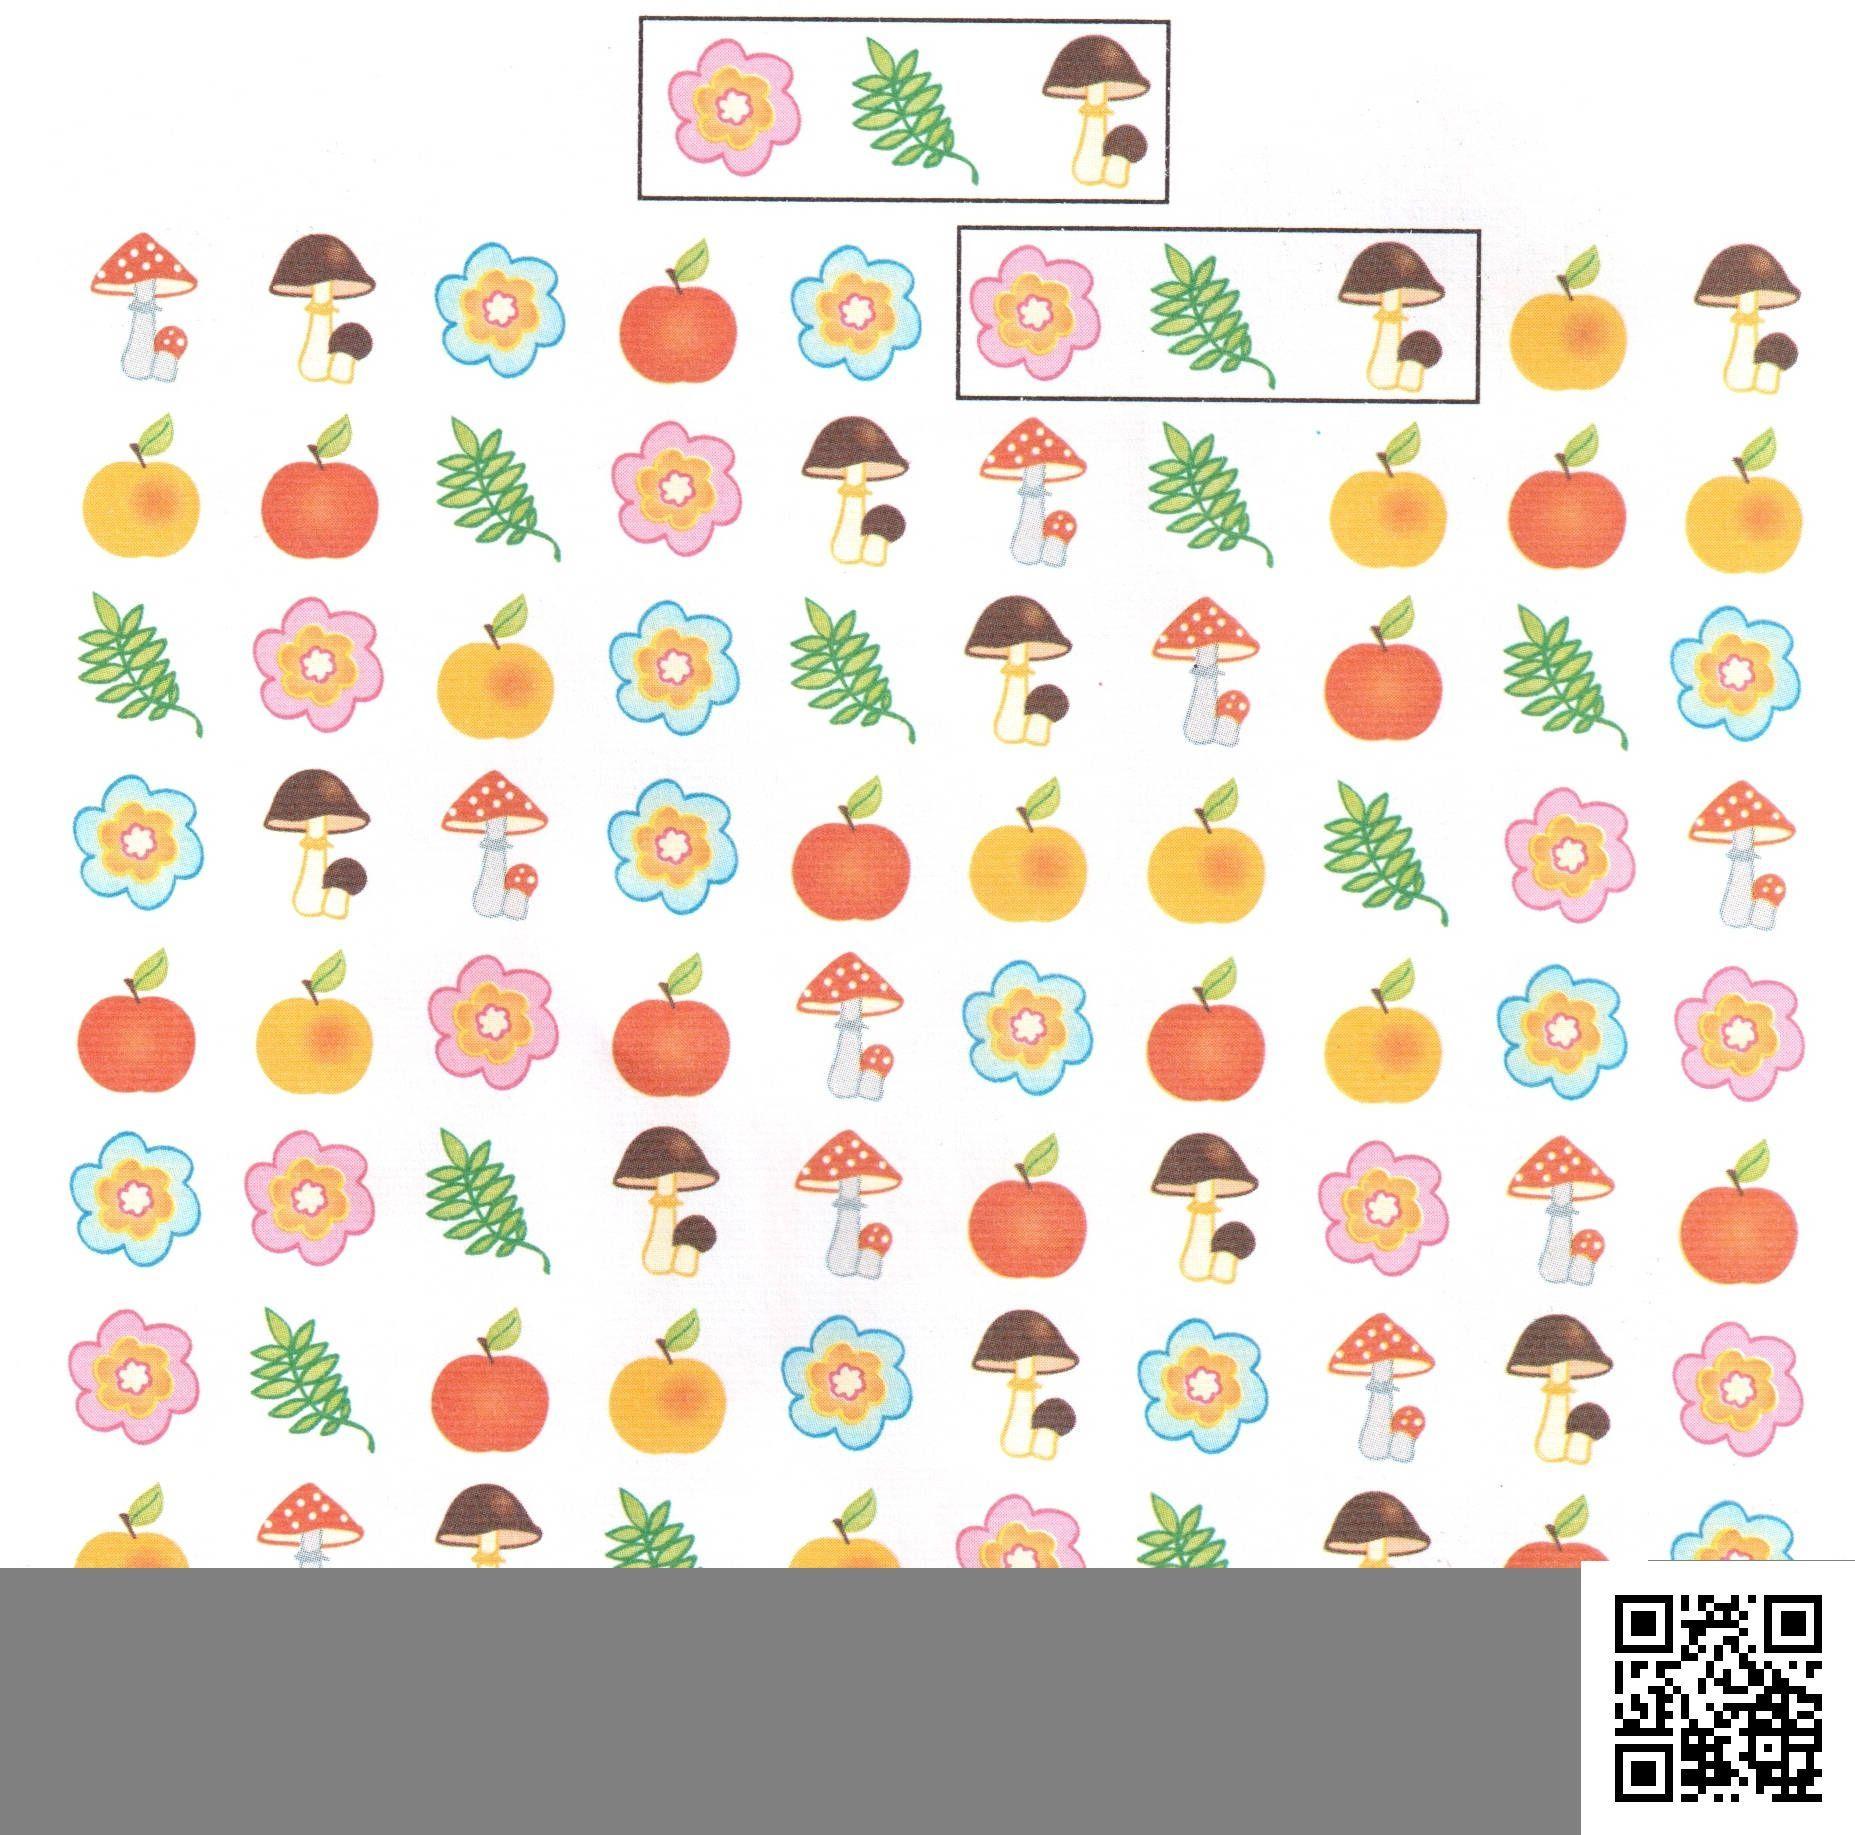 Pin By Waiyi Lau On Visual Perception